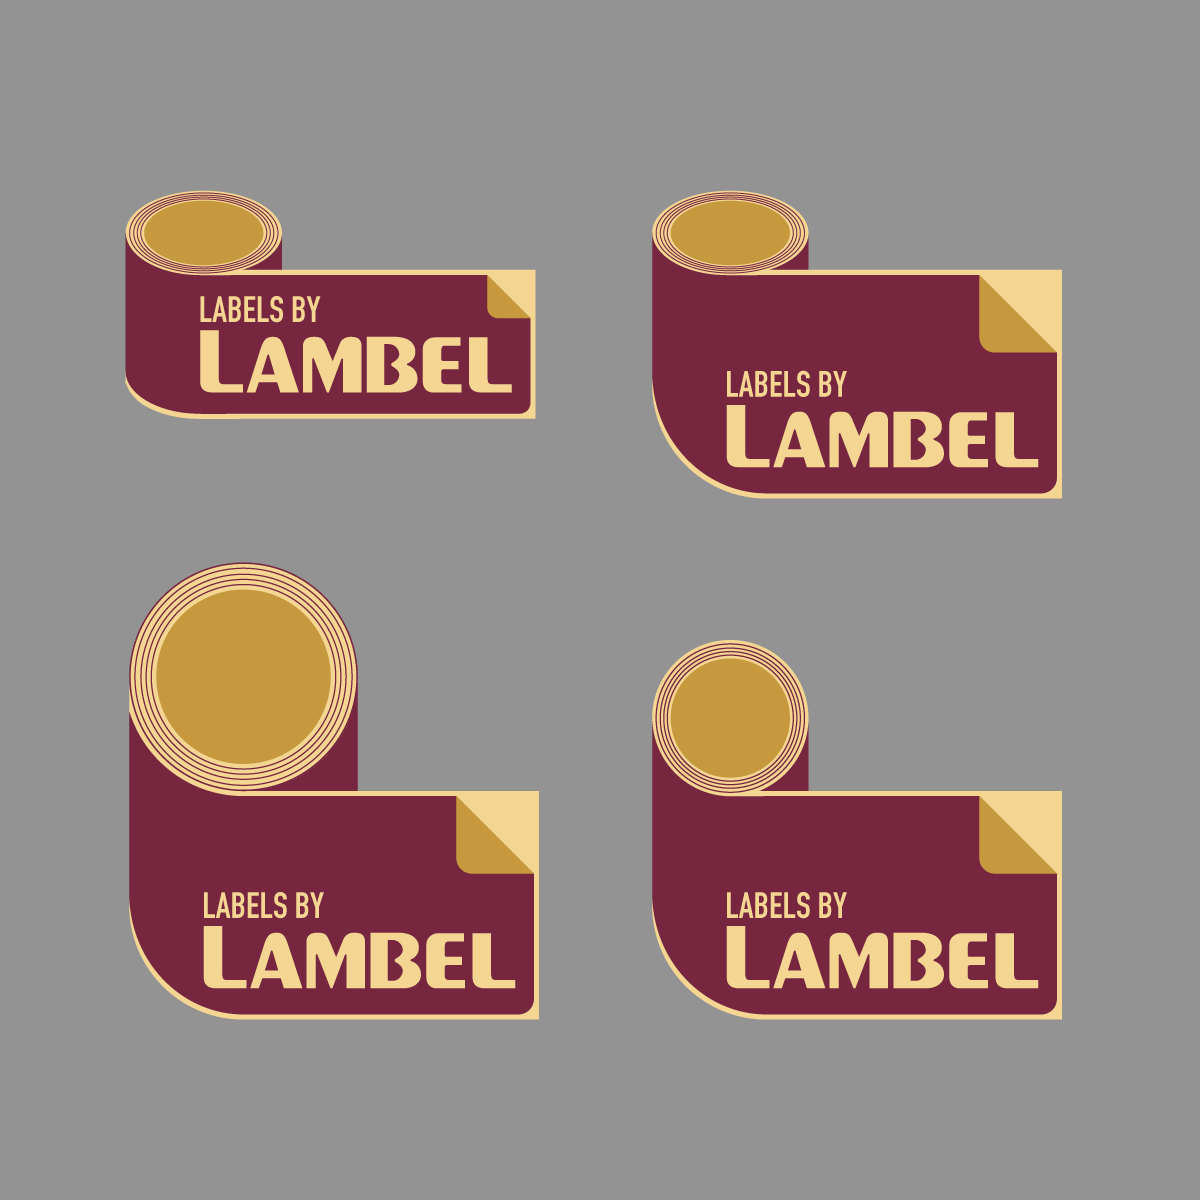 Lambel-GDF